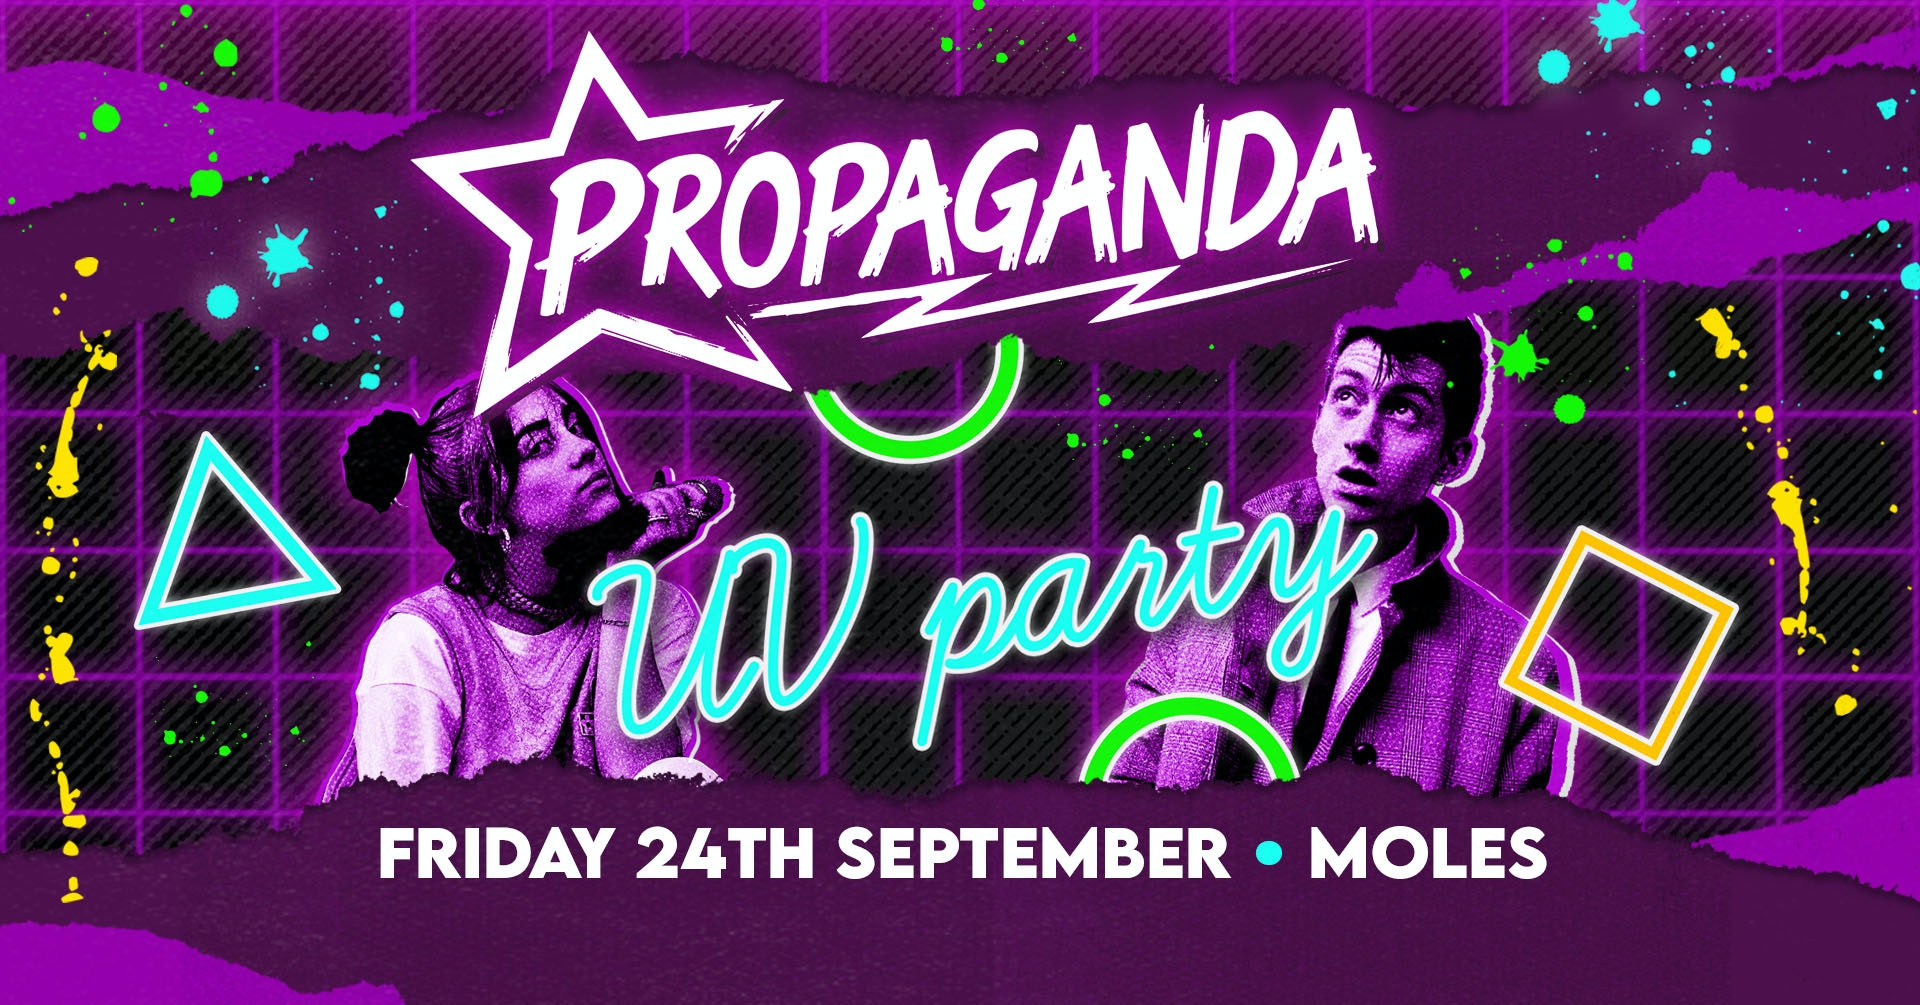 Propaganda Bath – UV Party!